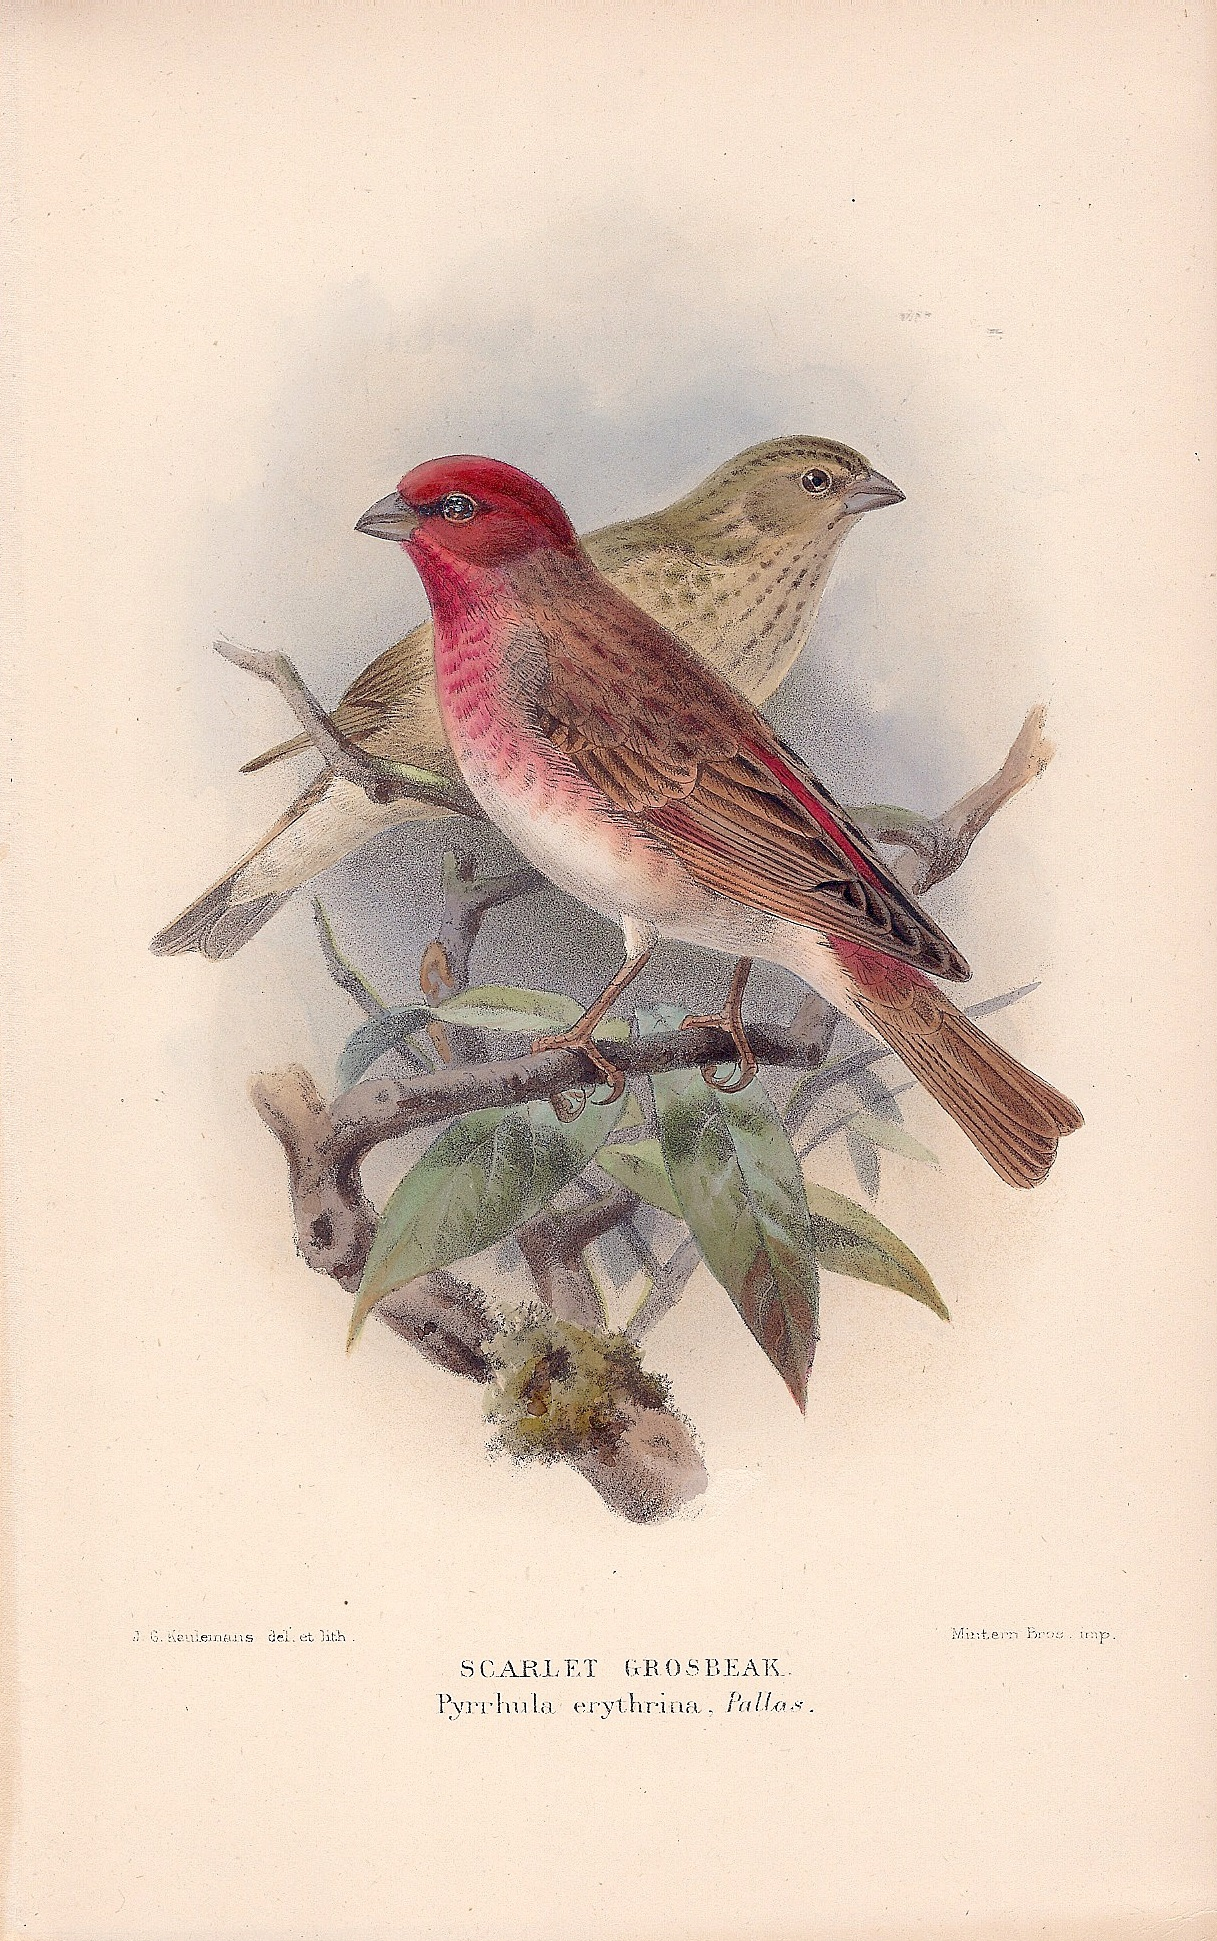 Scarlet Grosbeak